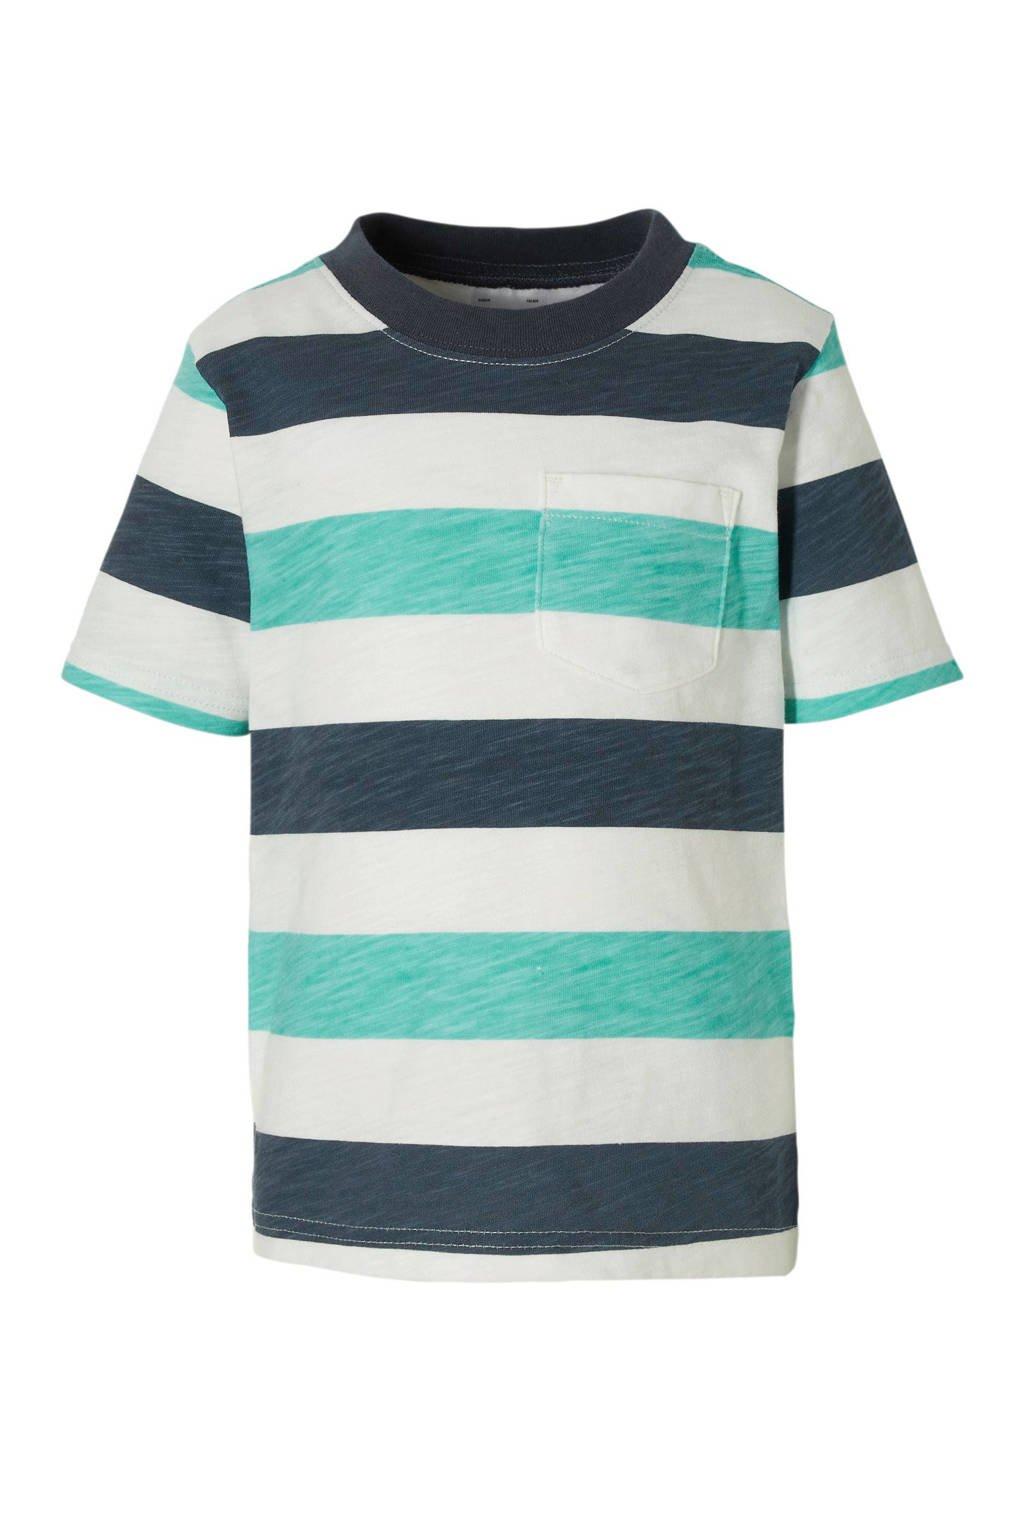 Carter's baby gestreept T-shirt donkerblauw/groen/wit, Donkerblauw/groen/wit